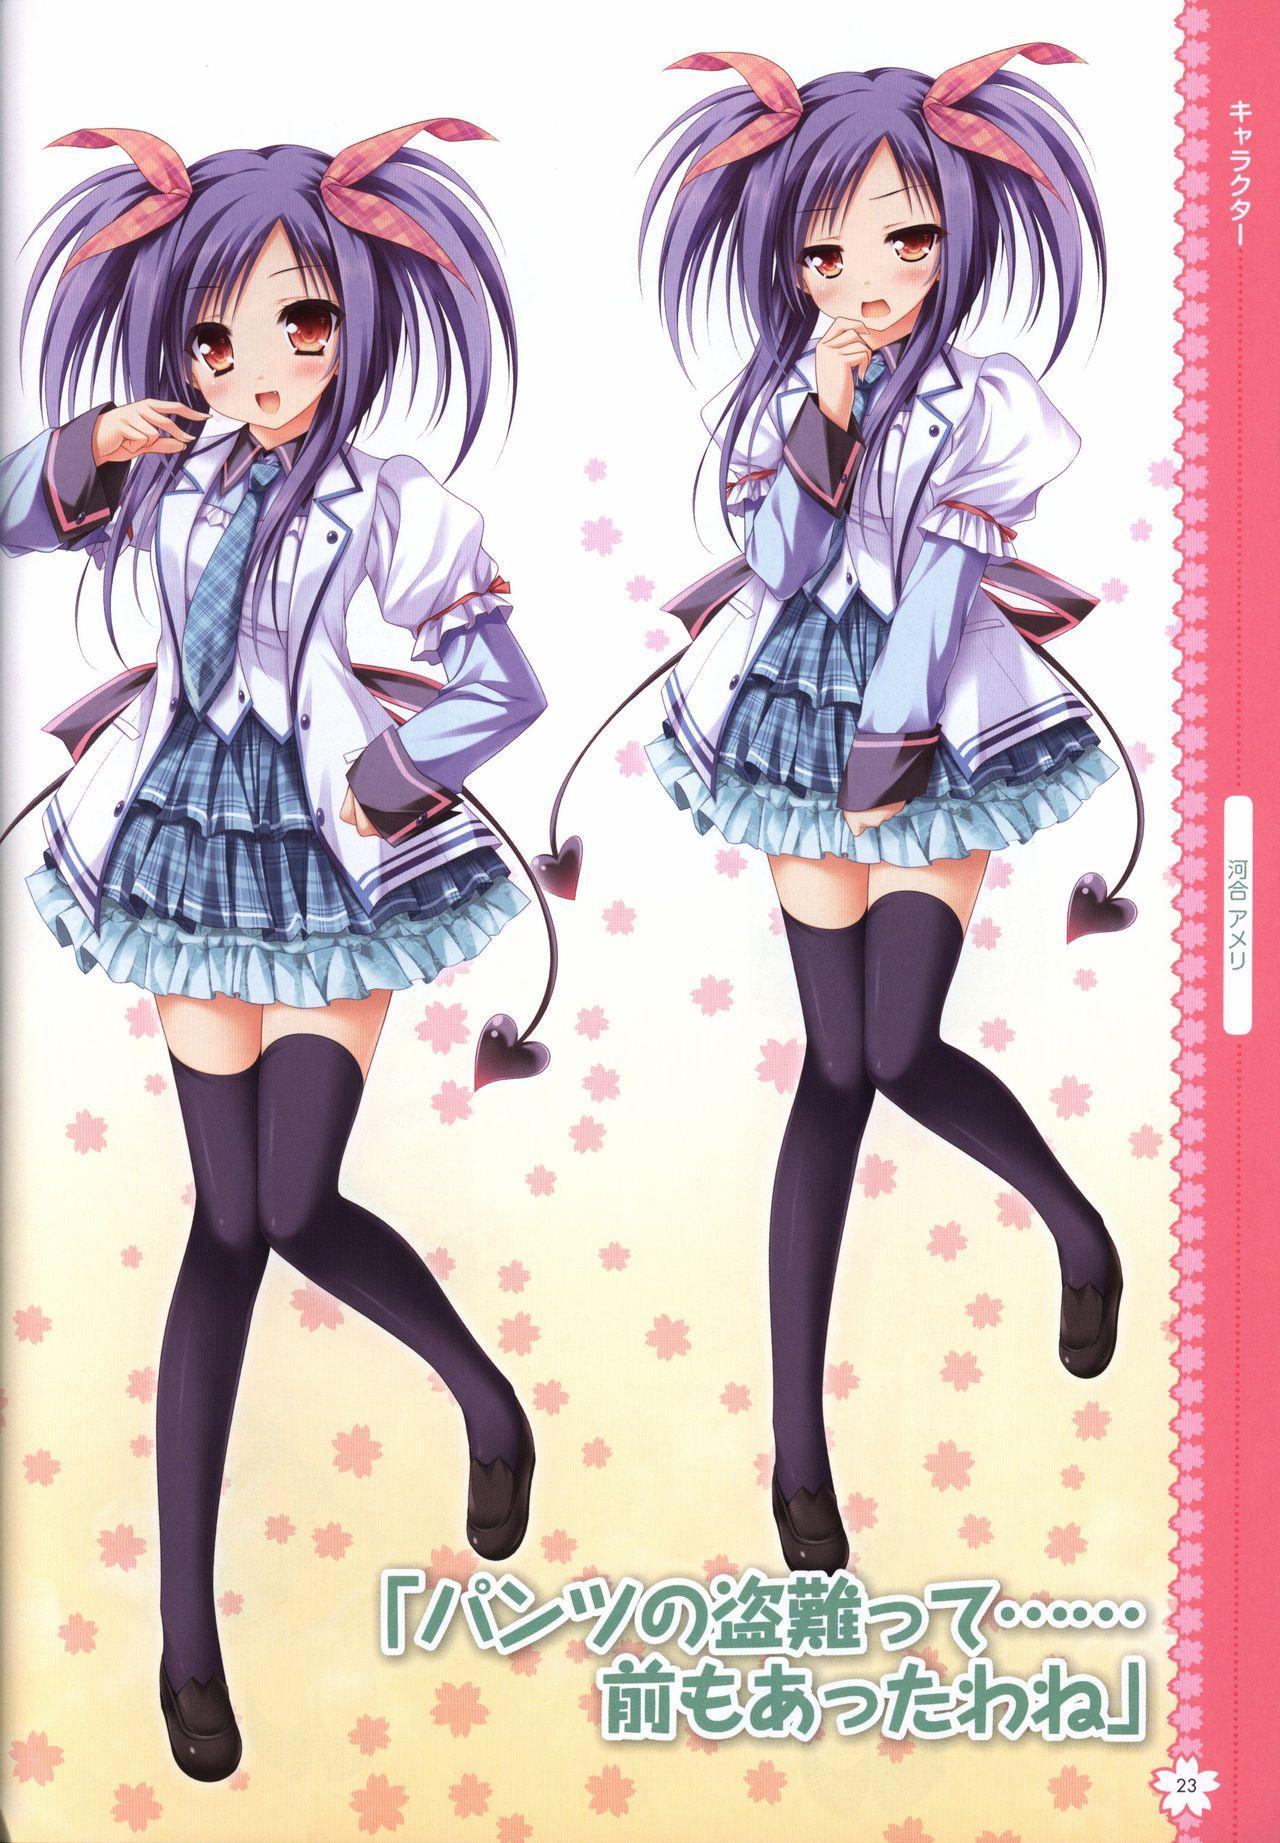 Tayutama2 Visual Art Fanbook 25